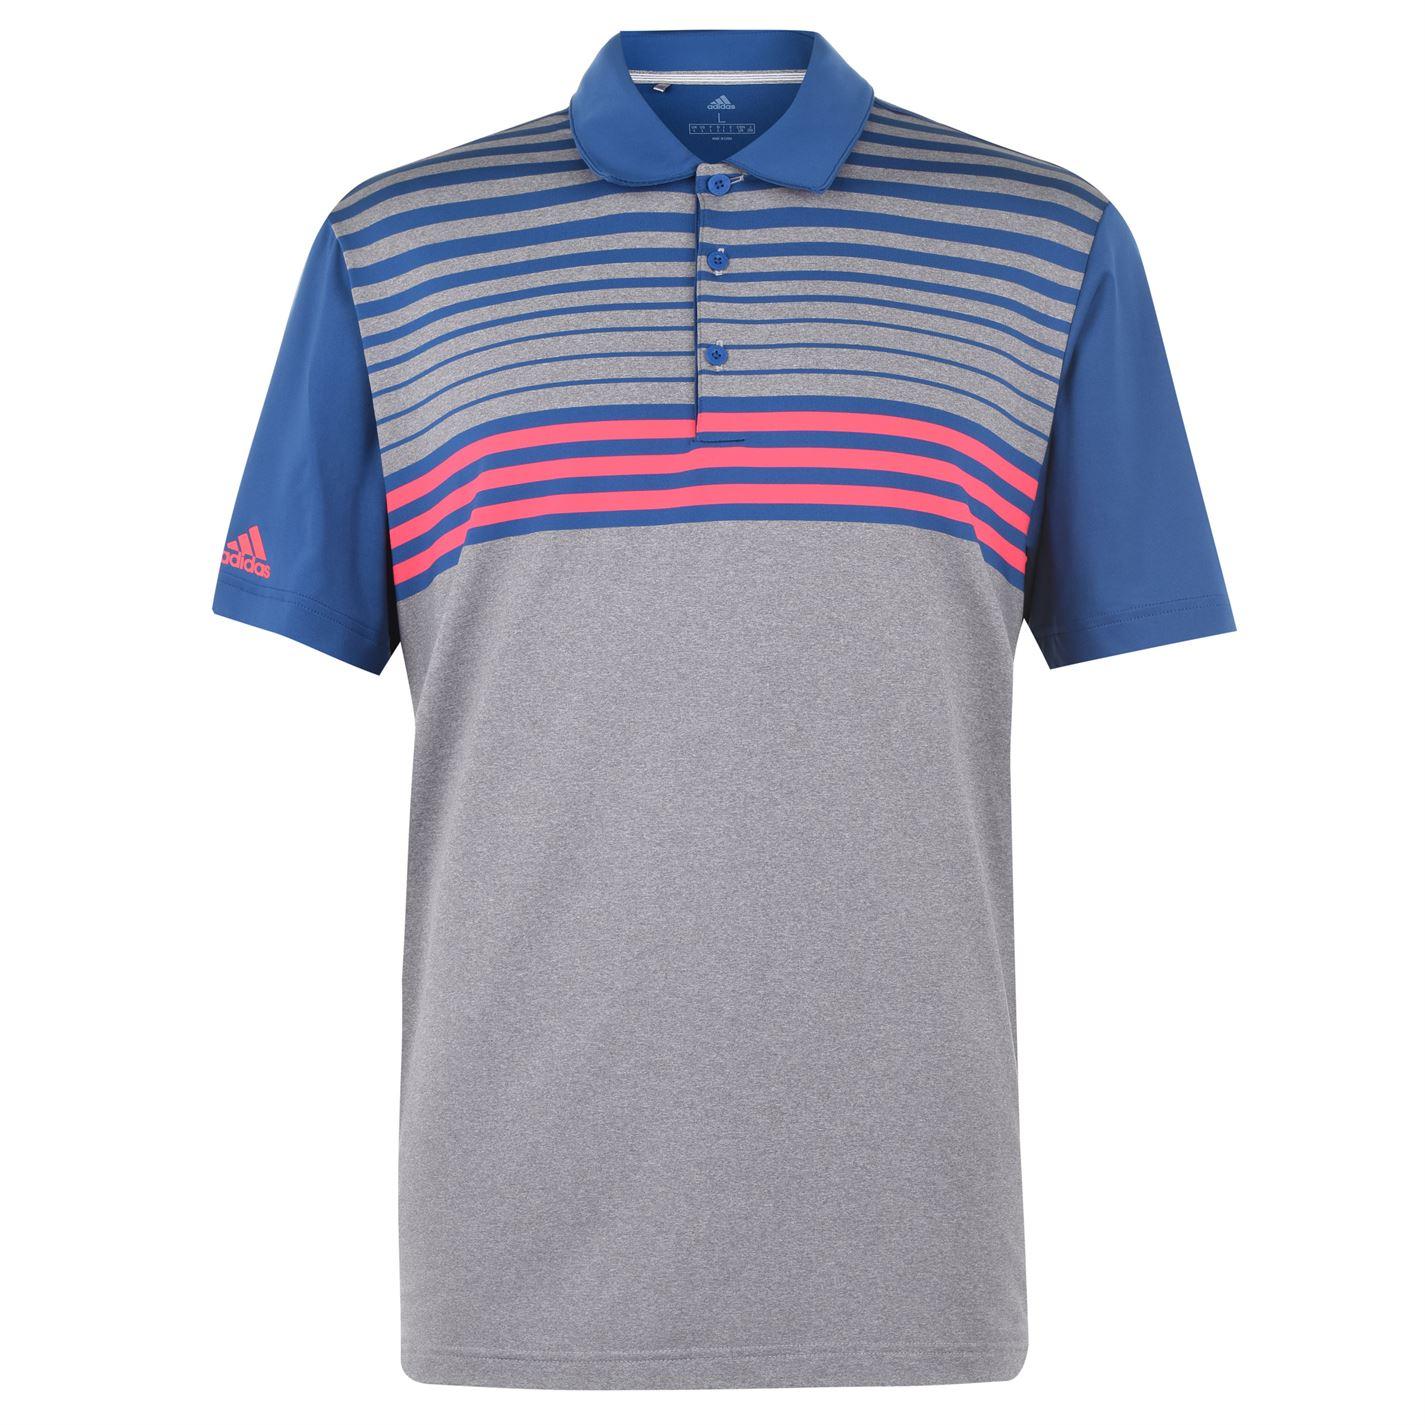 Adidas Ultra Stripe Gradient Polo Shirt Mens